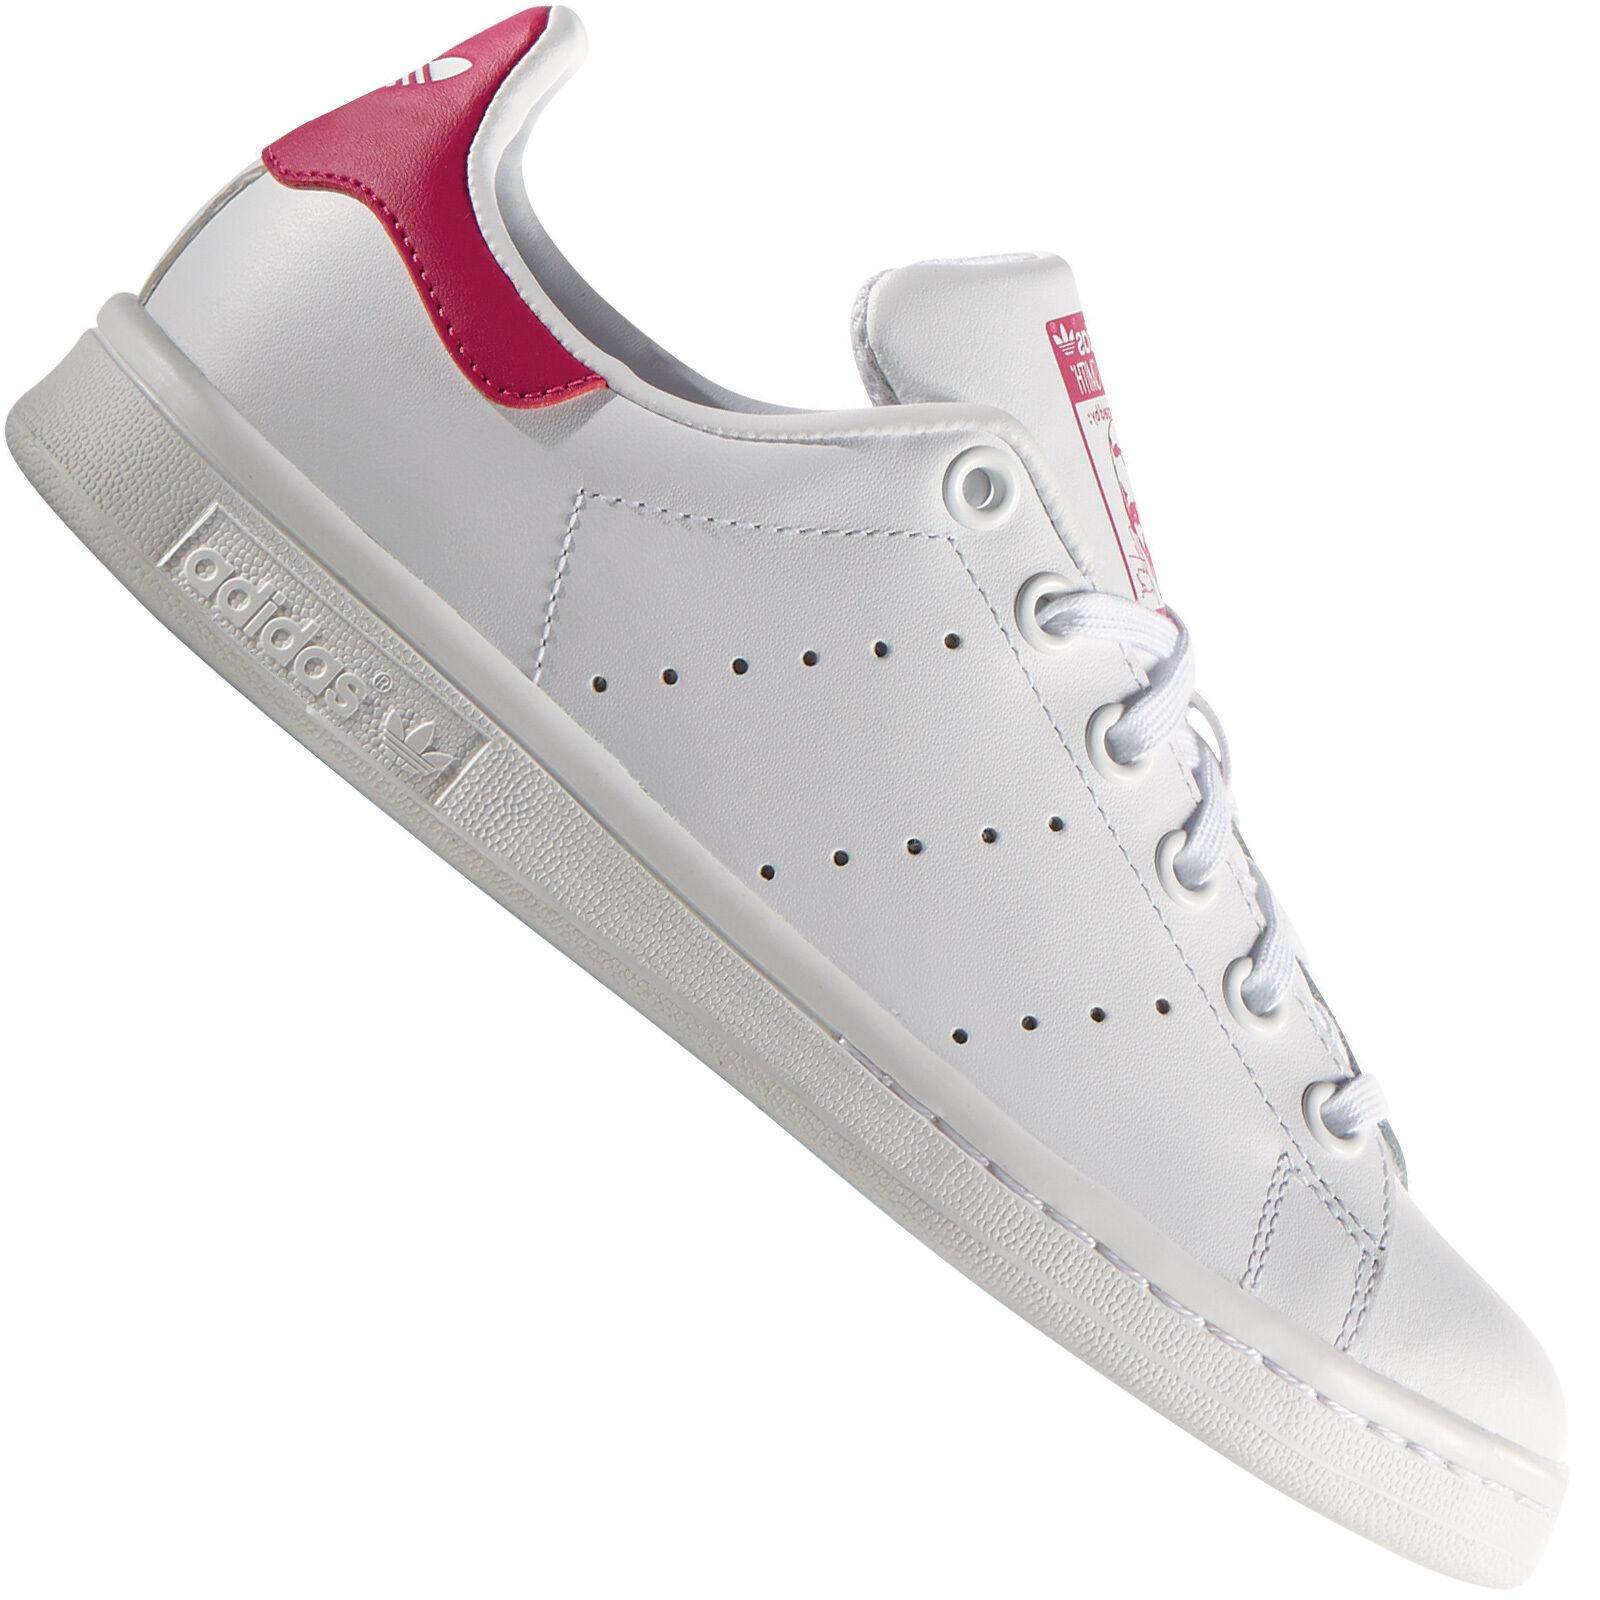 le scarpe da ginnastica adidas / junior originali stan smith b32703 5